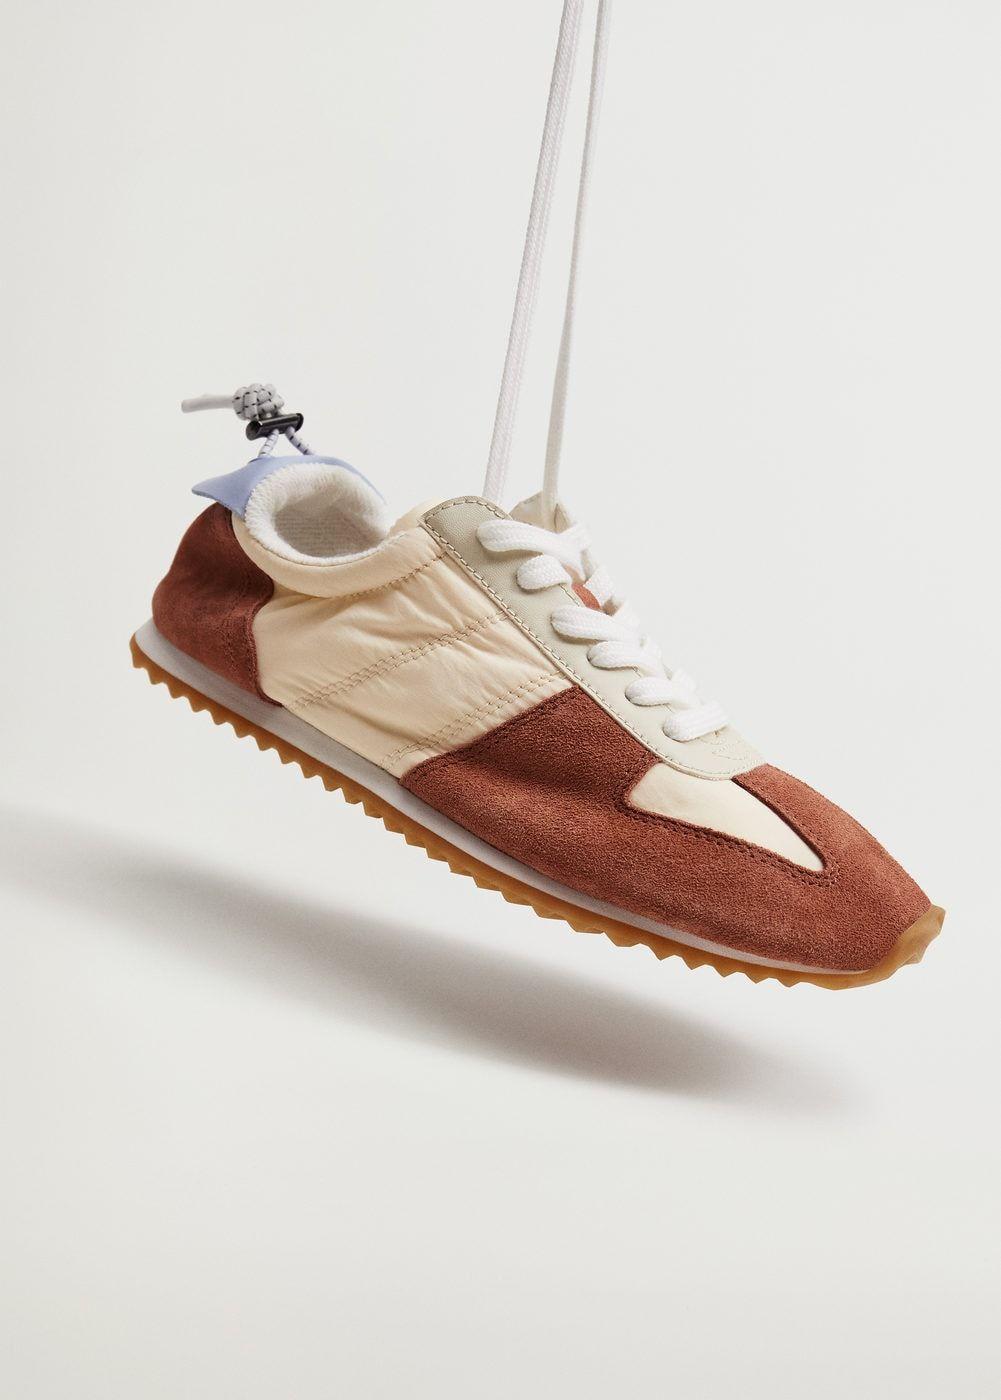 best new fashion items 286246 1629961991952